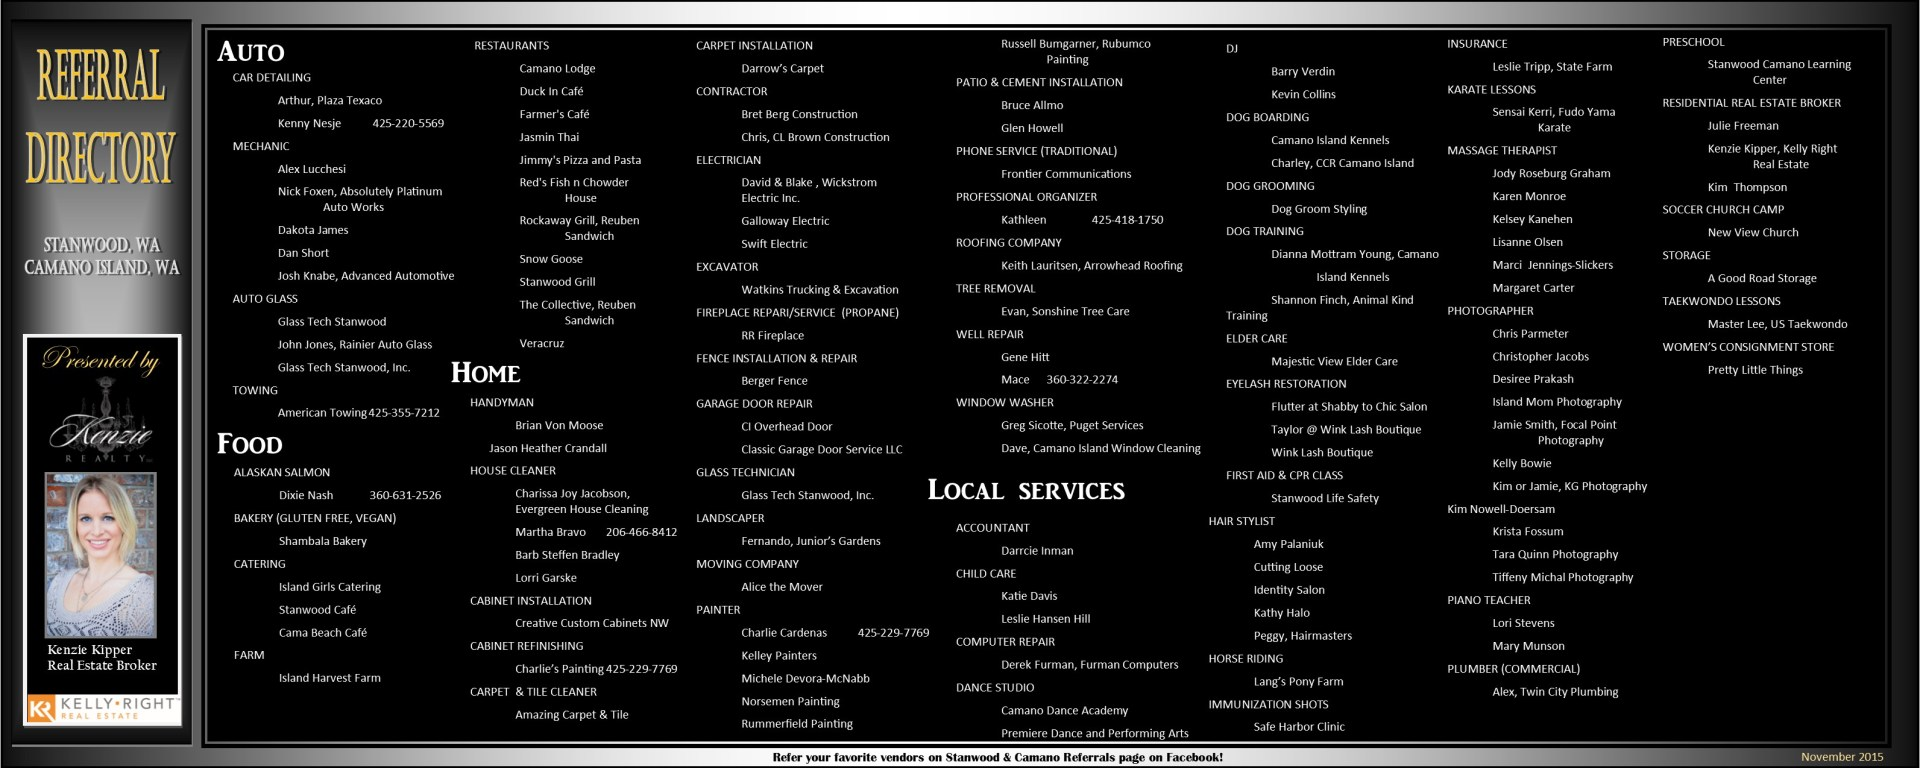 november 2015 referral directory